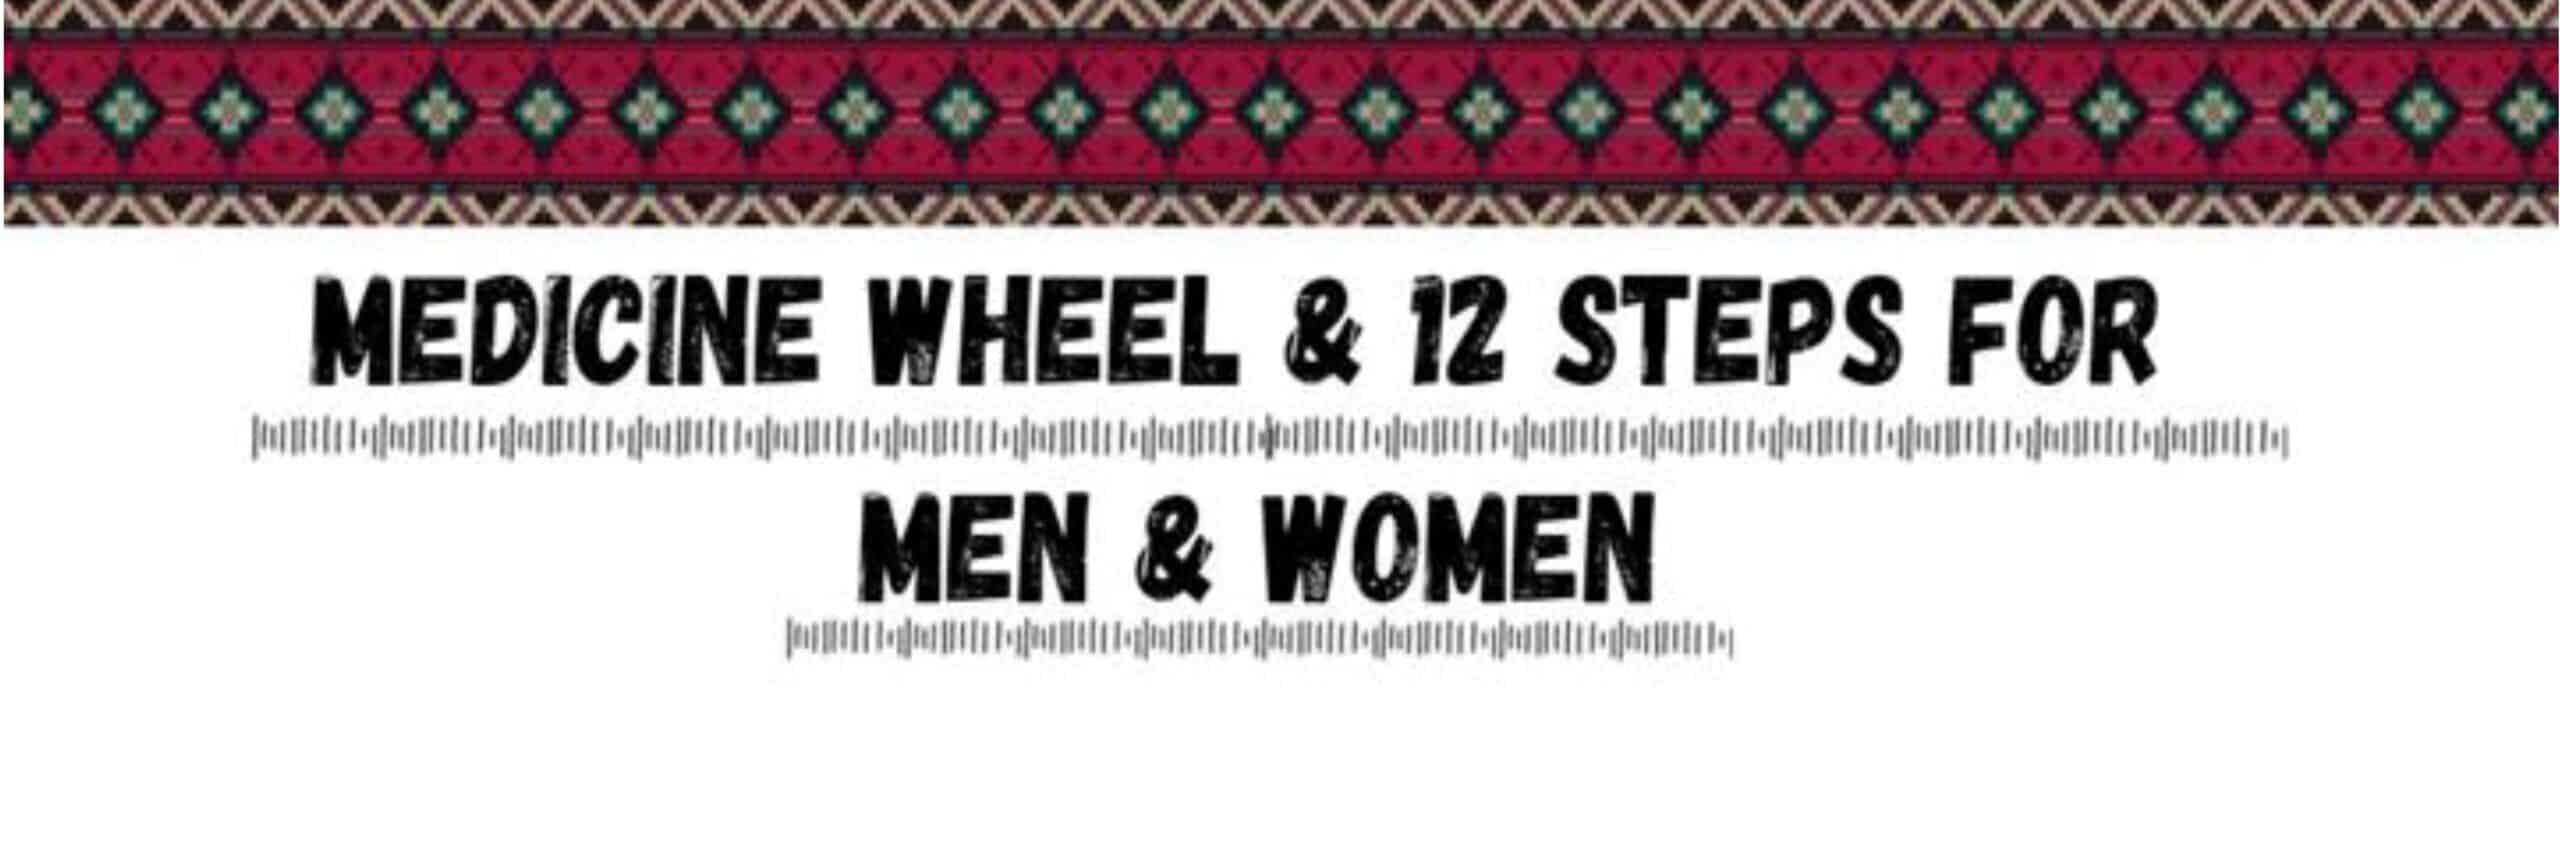 Medicine Wheel & 12 Steps for Men and Women (June 3-5, 2022)